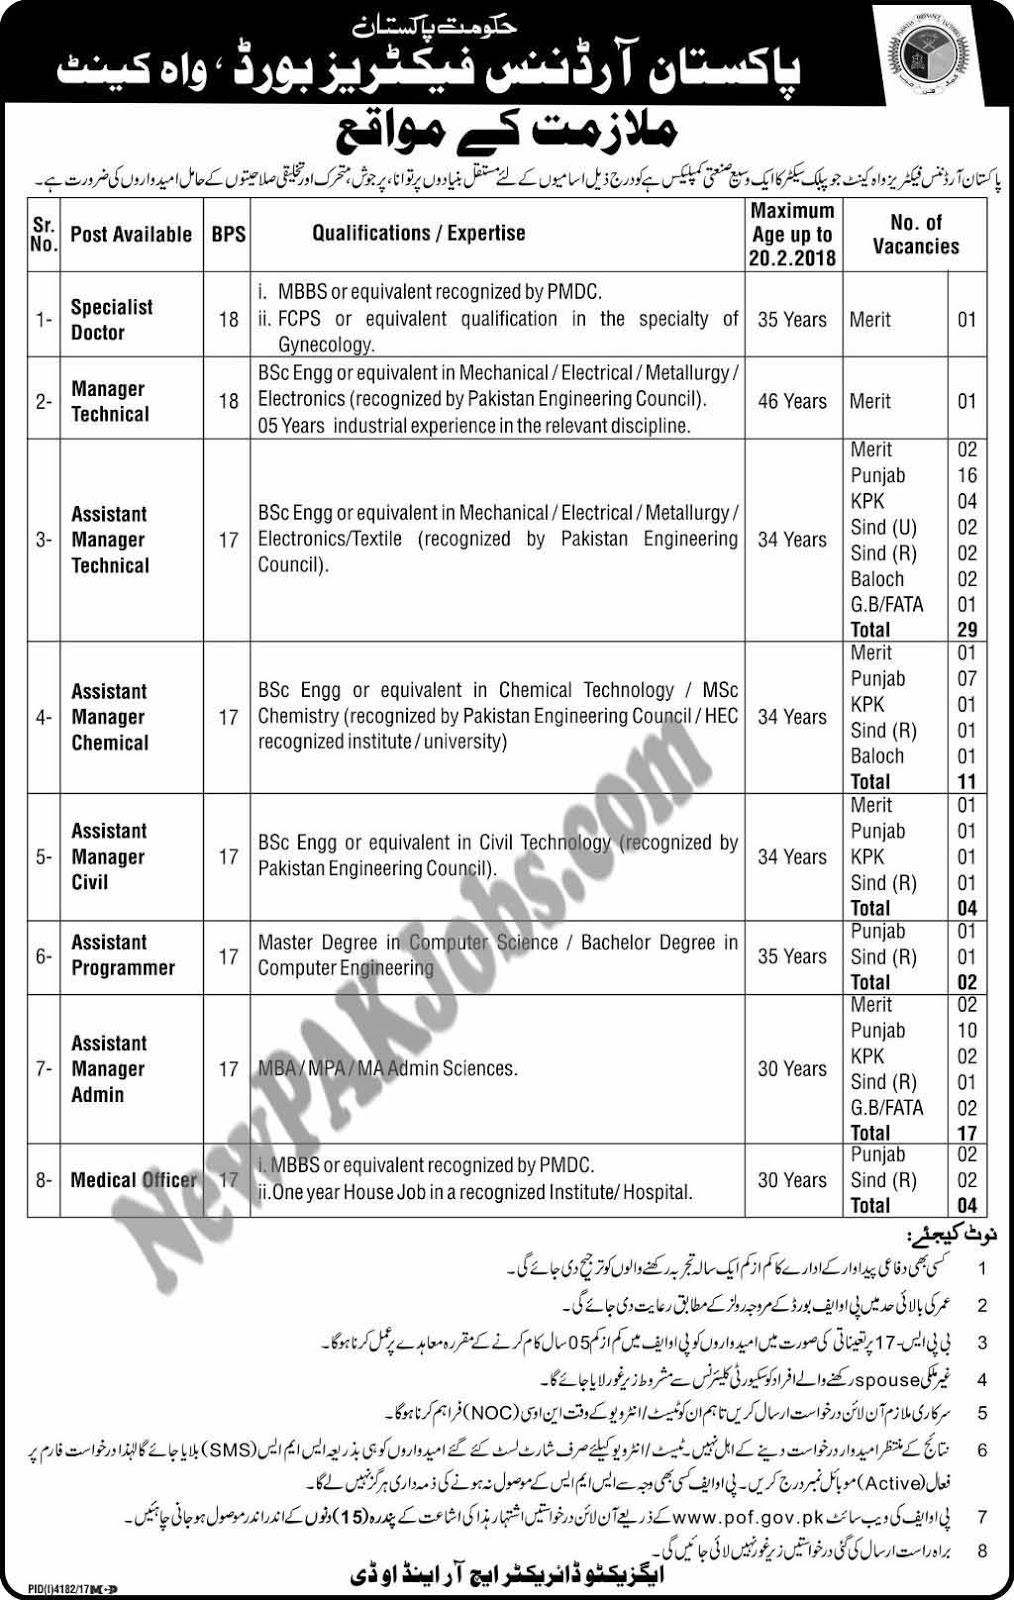 Jobs in Pakistan Ordnance Factories Govt Of Pakistan, Wah Cantt Feb 2018